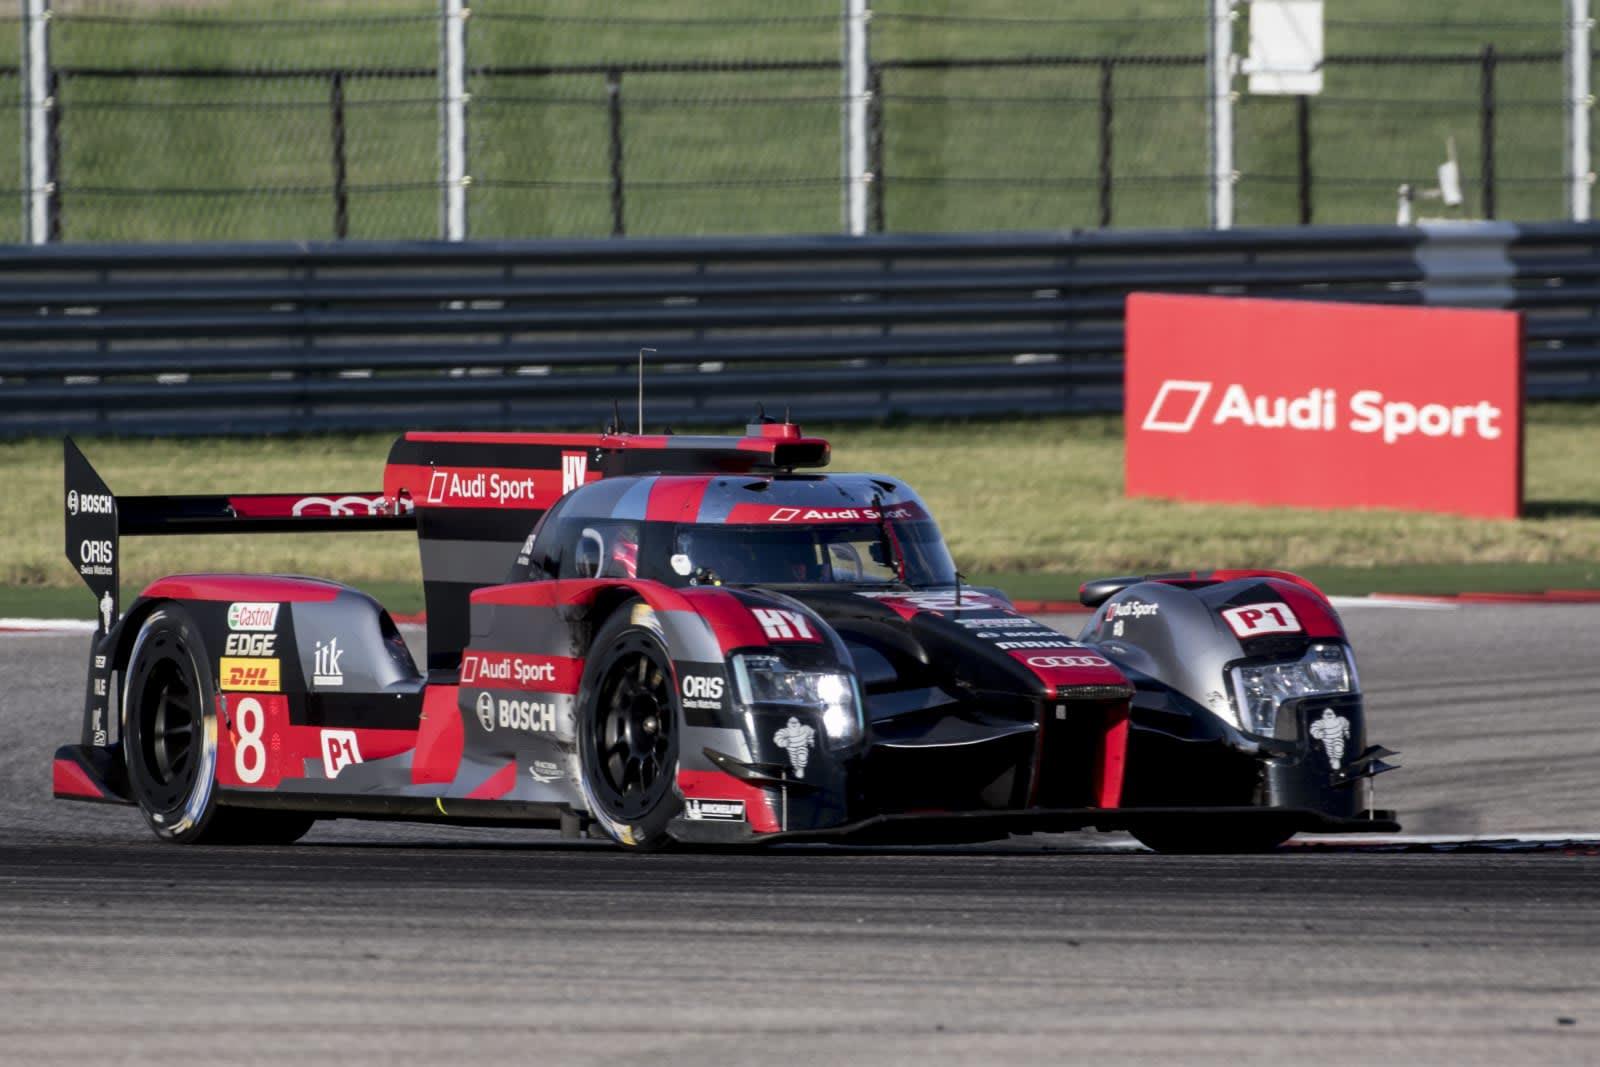 Audi drops Le Mans in favor of Formula E